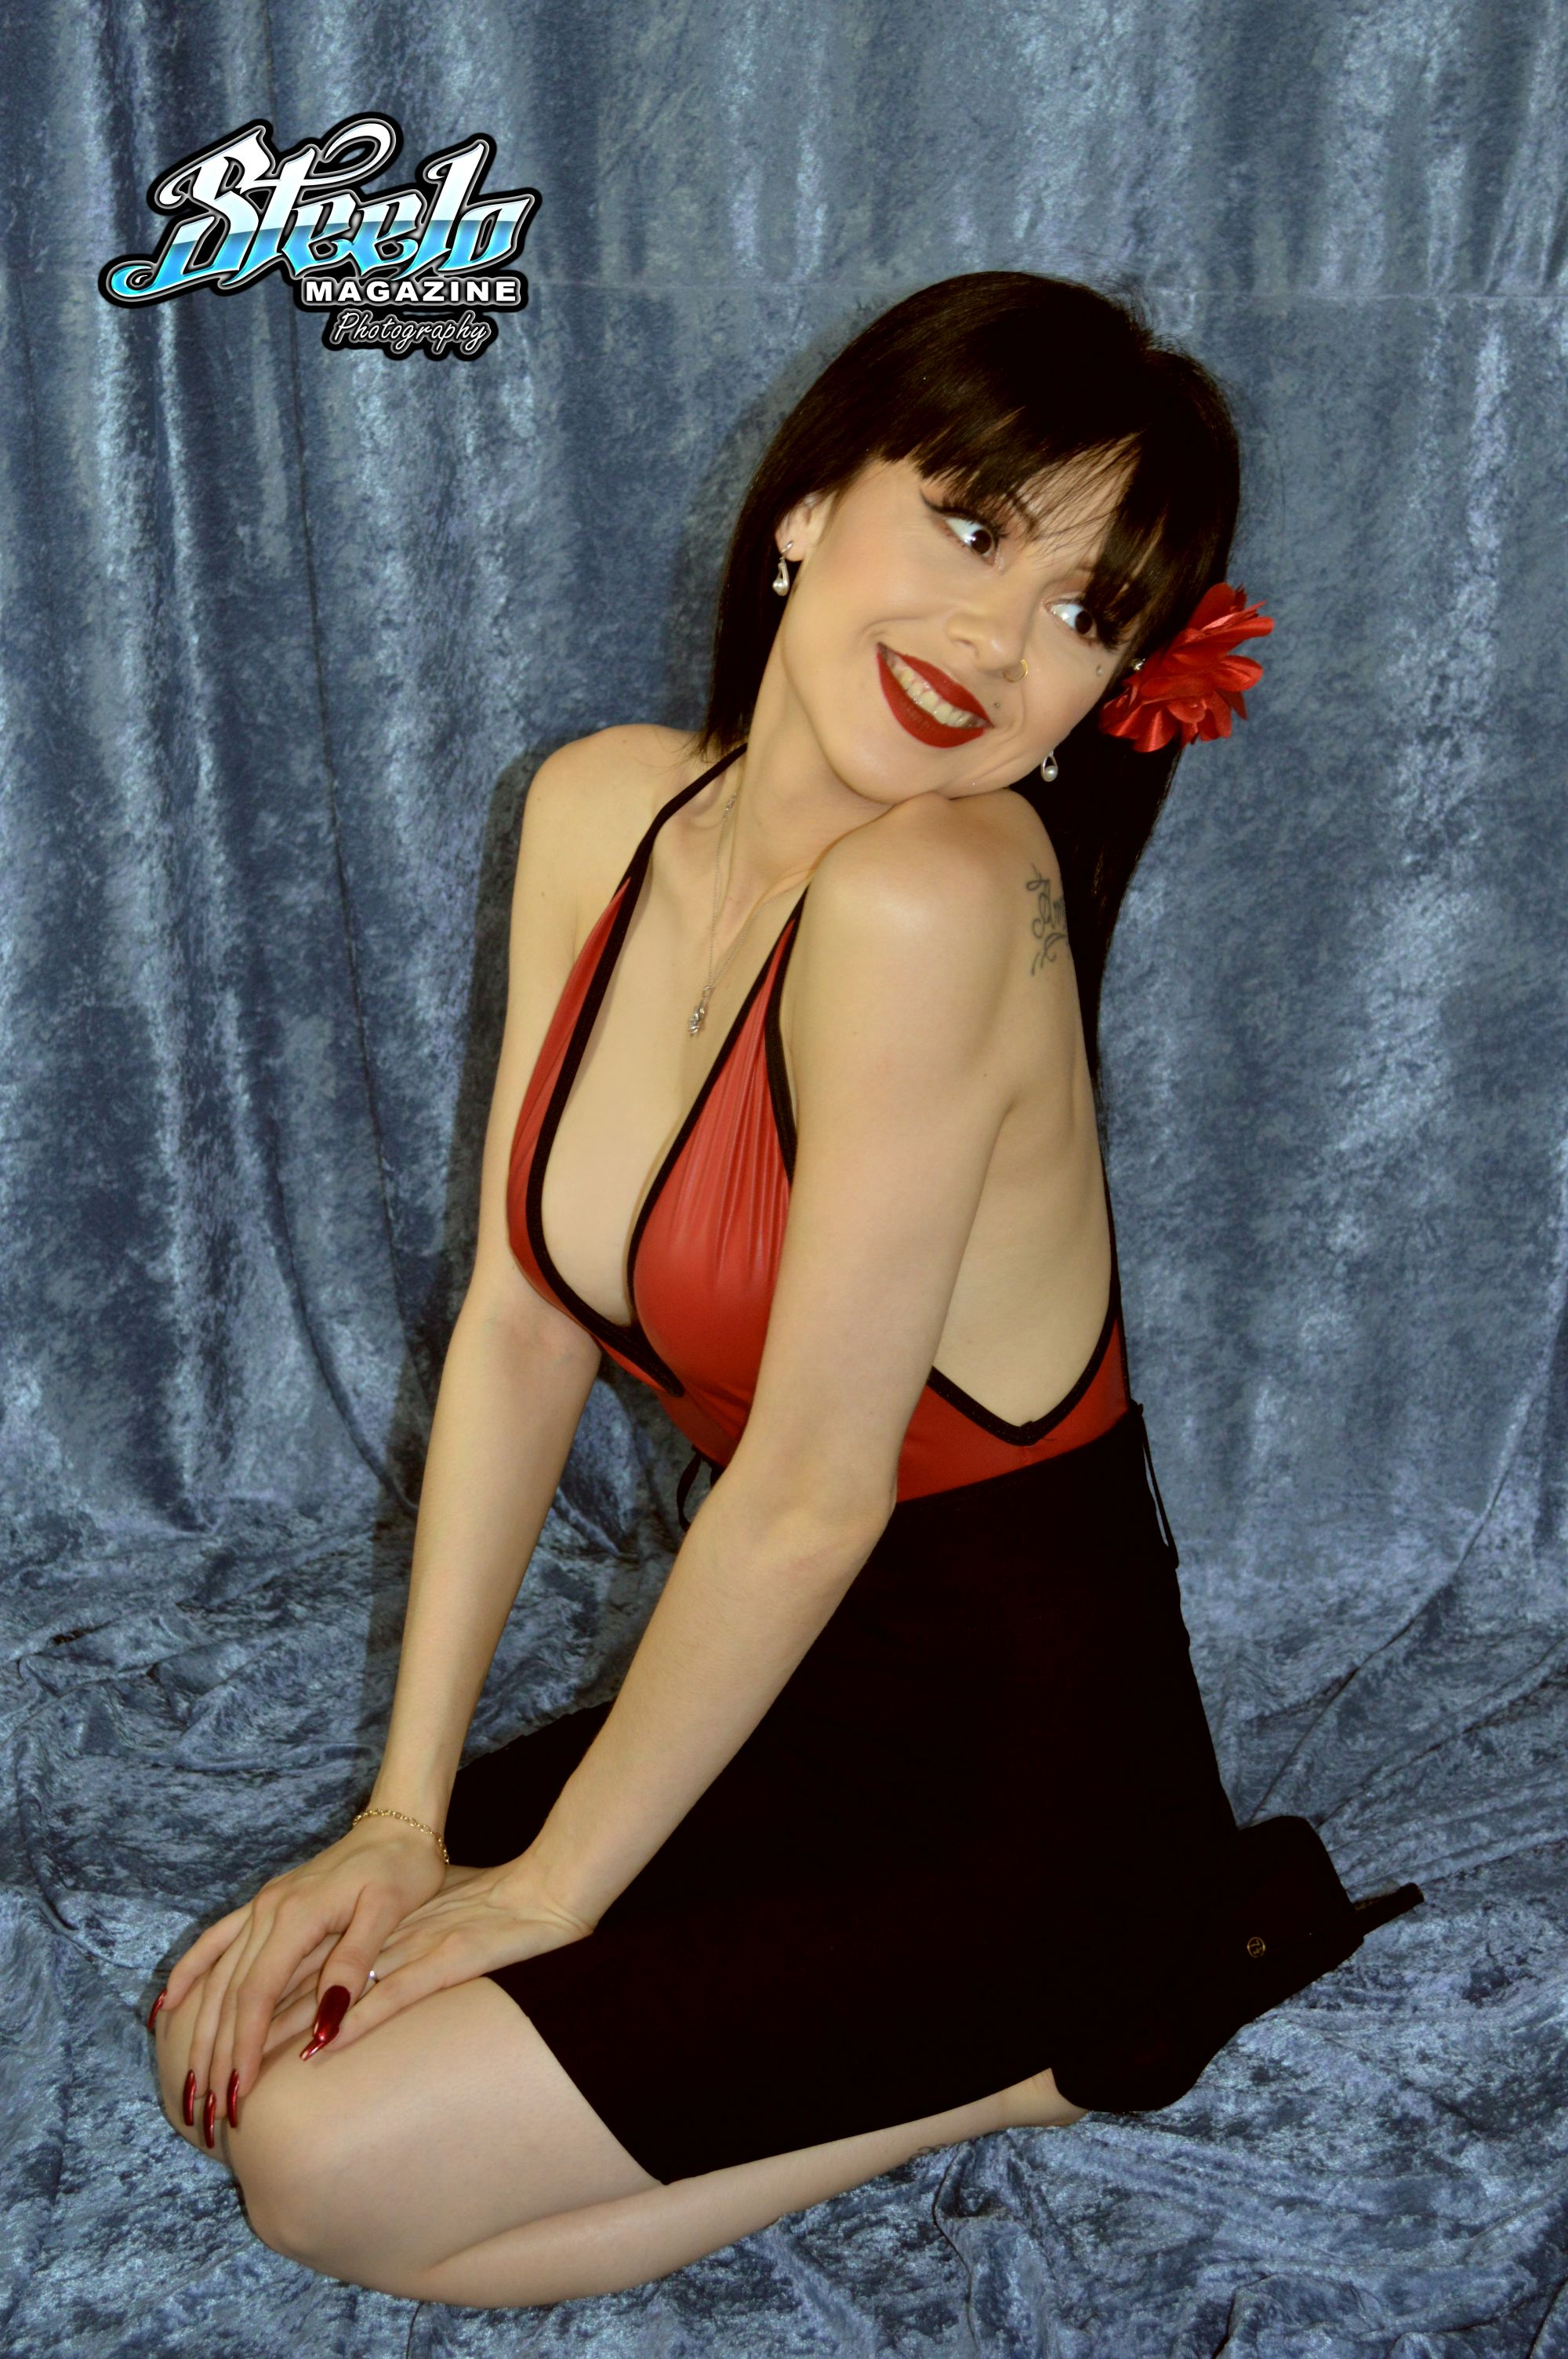 darlene-1st-photo-shoot-586